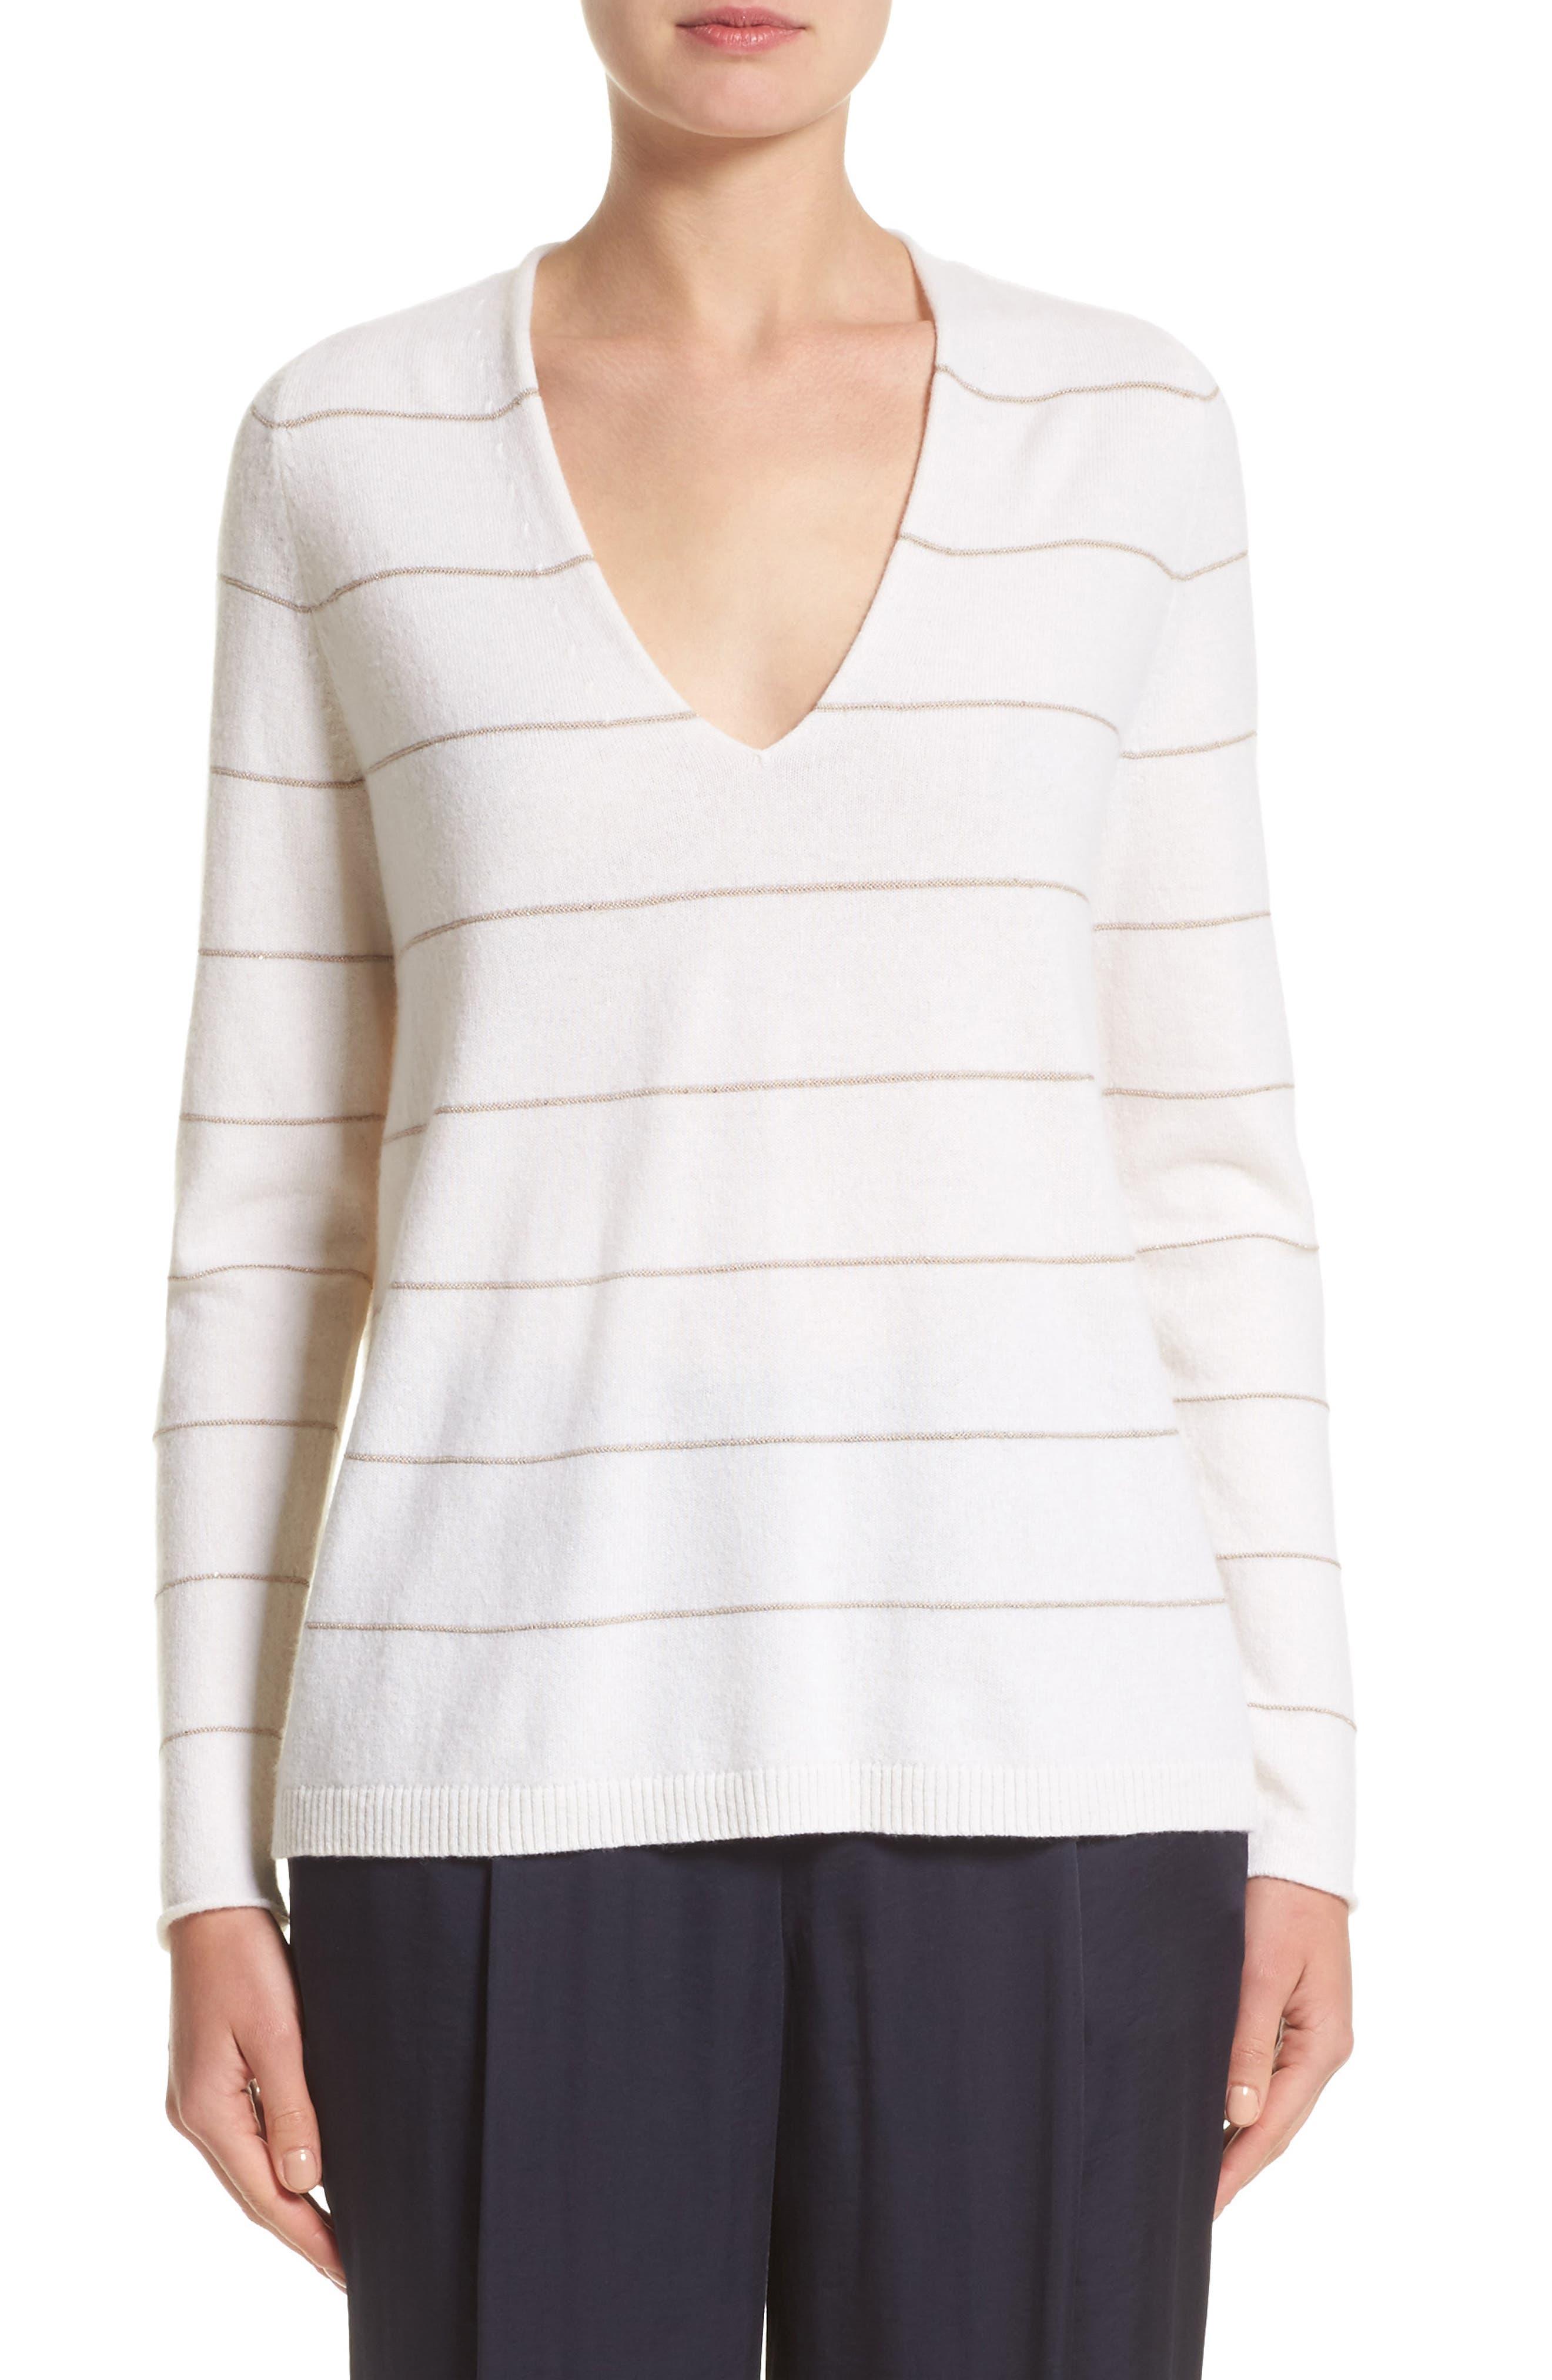 LAFAYETTE 148 NEW YORK Stripe Cashmere & Silk V-Neck Sweater